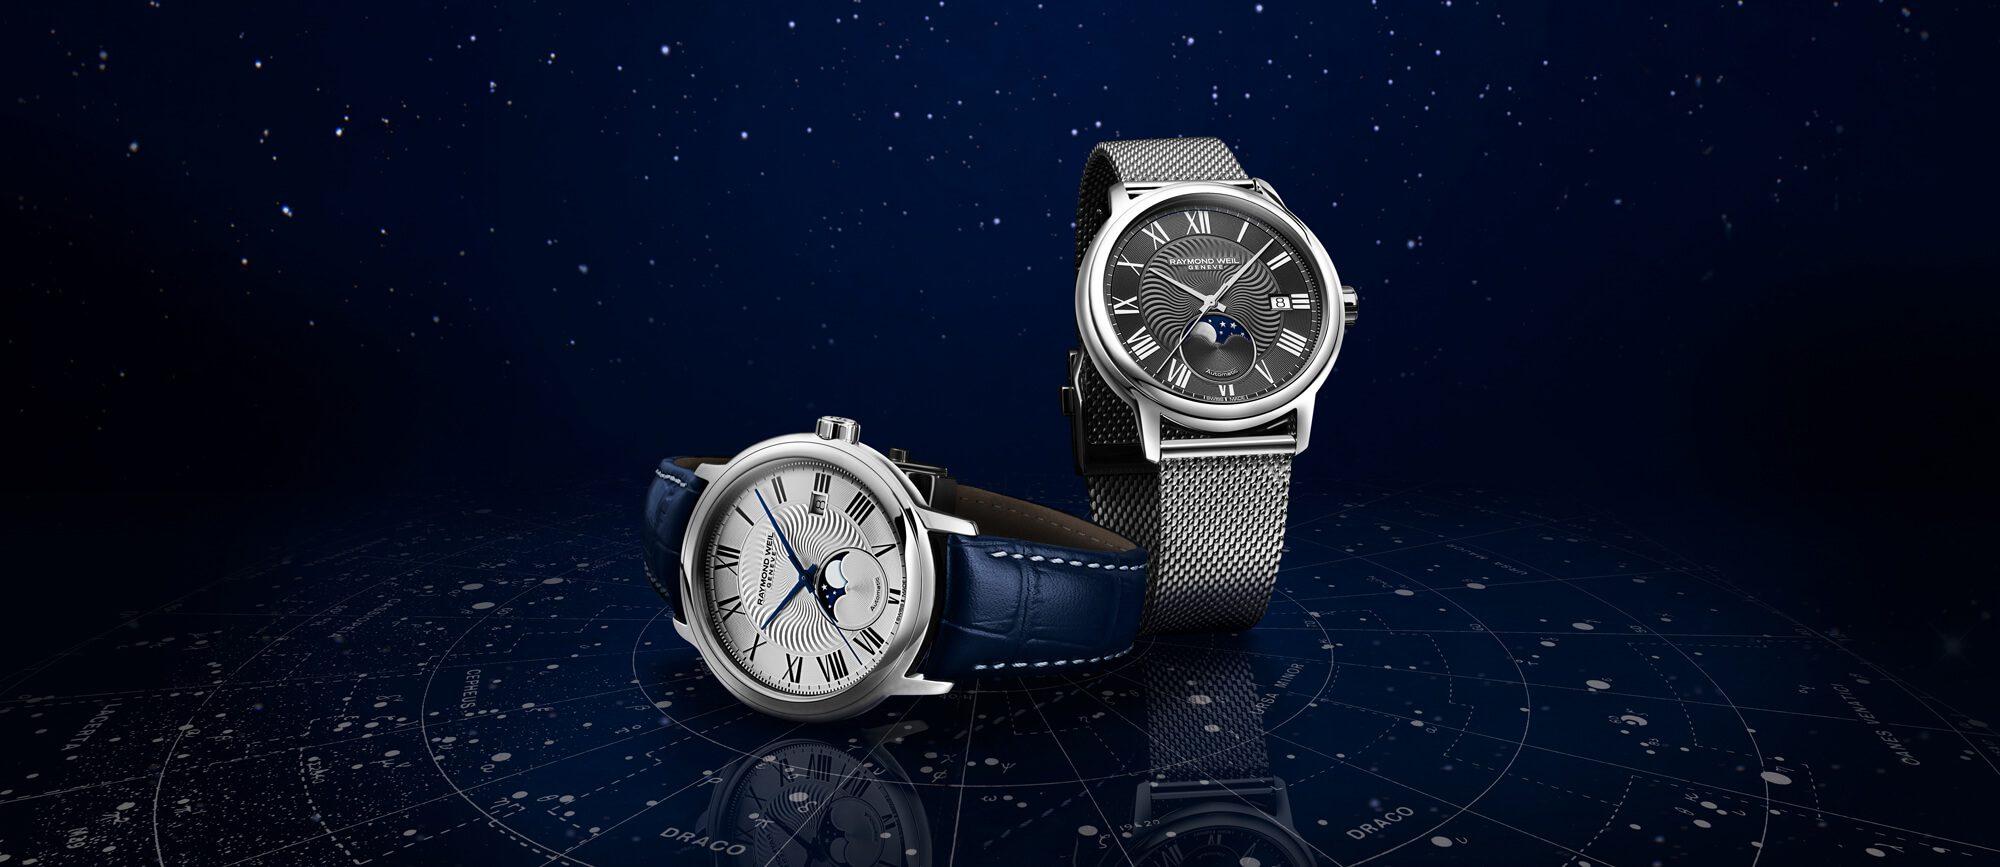 Maestro Moon Phase Grey Mesh Bracelet Watch RAYMOND WEIL